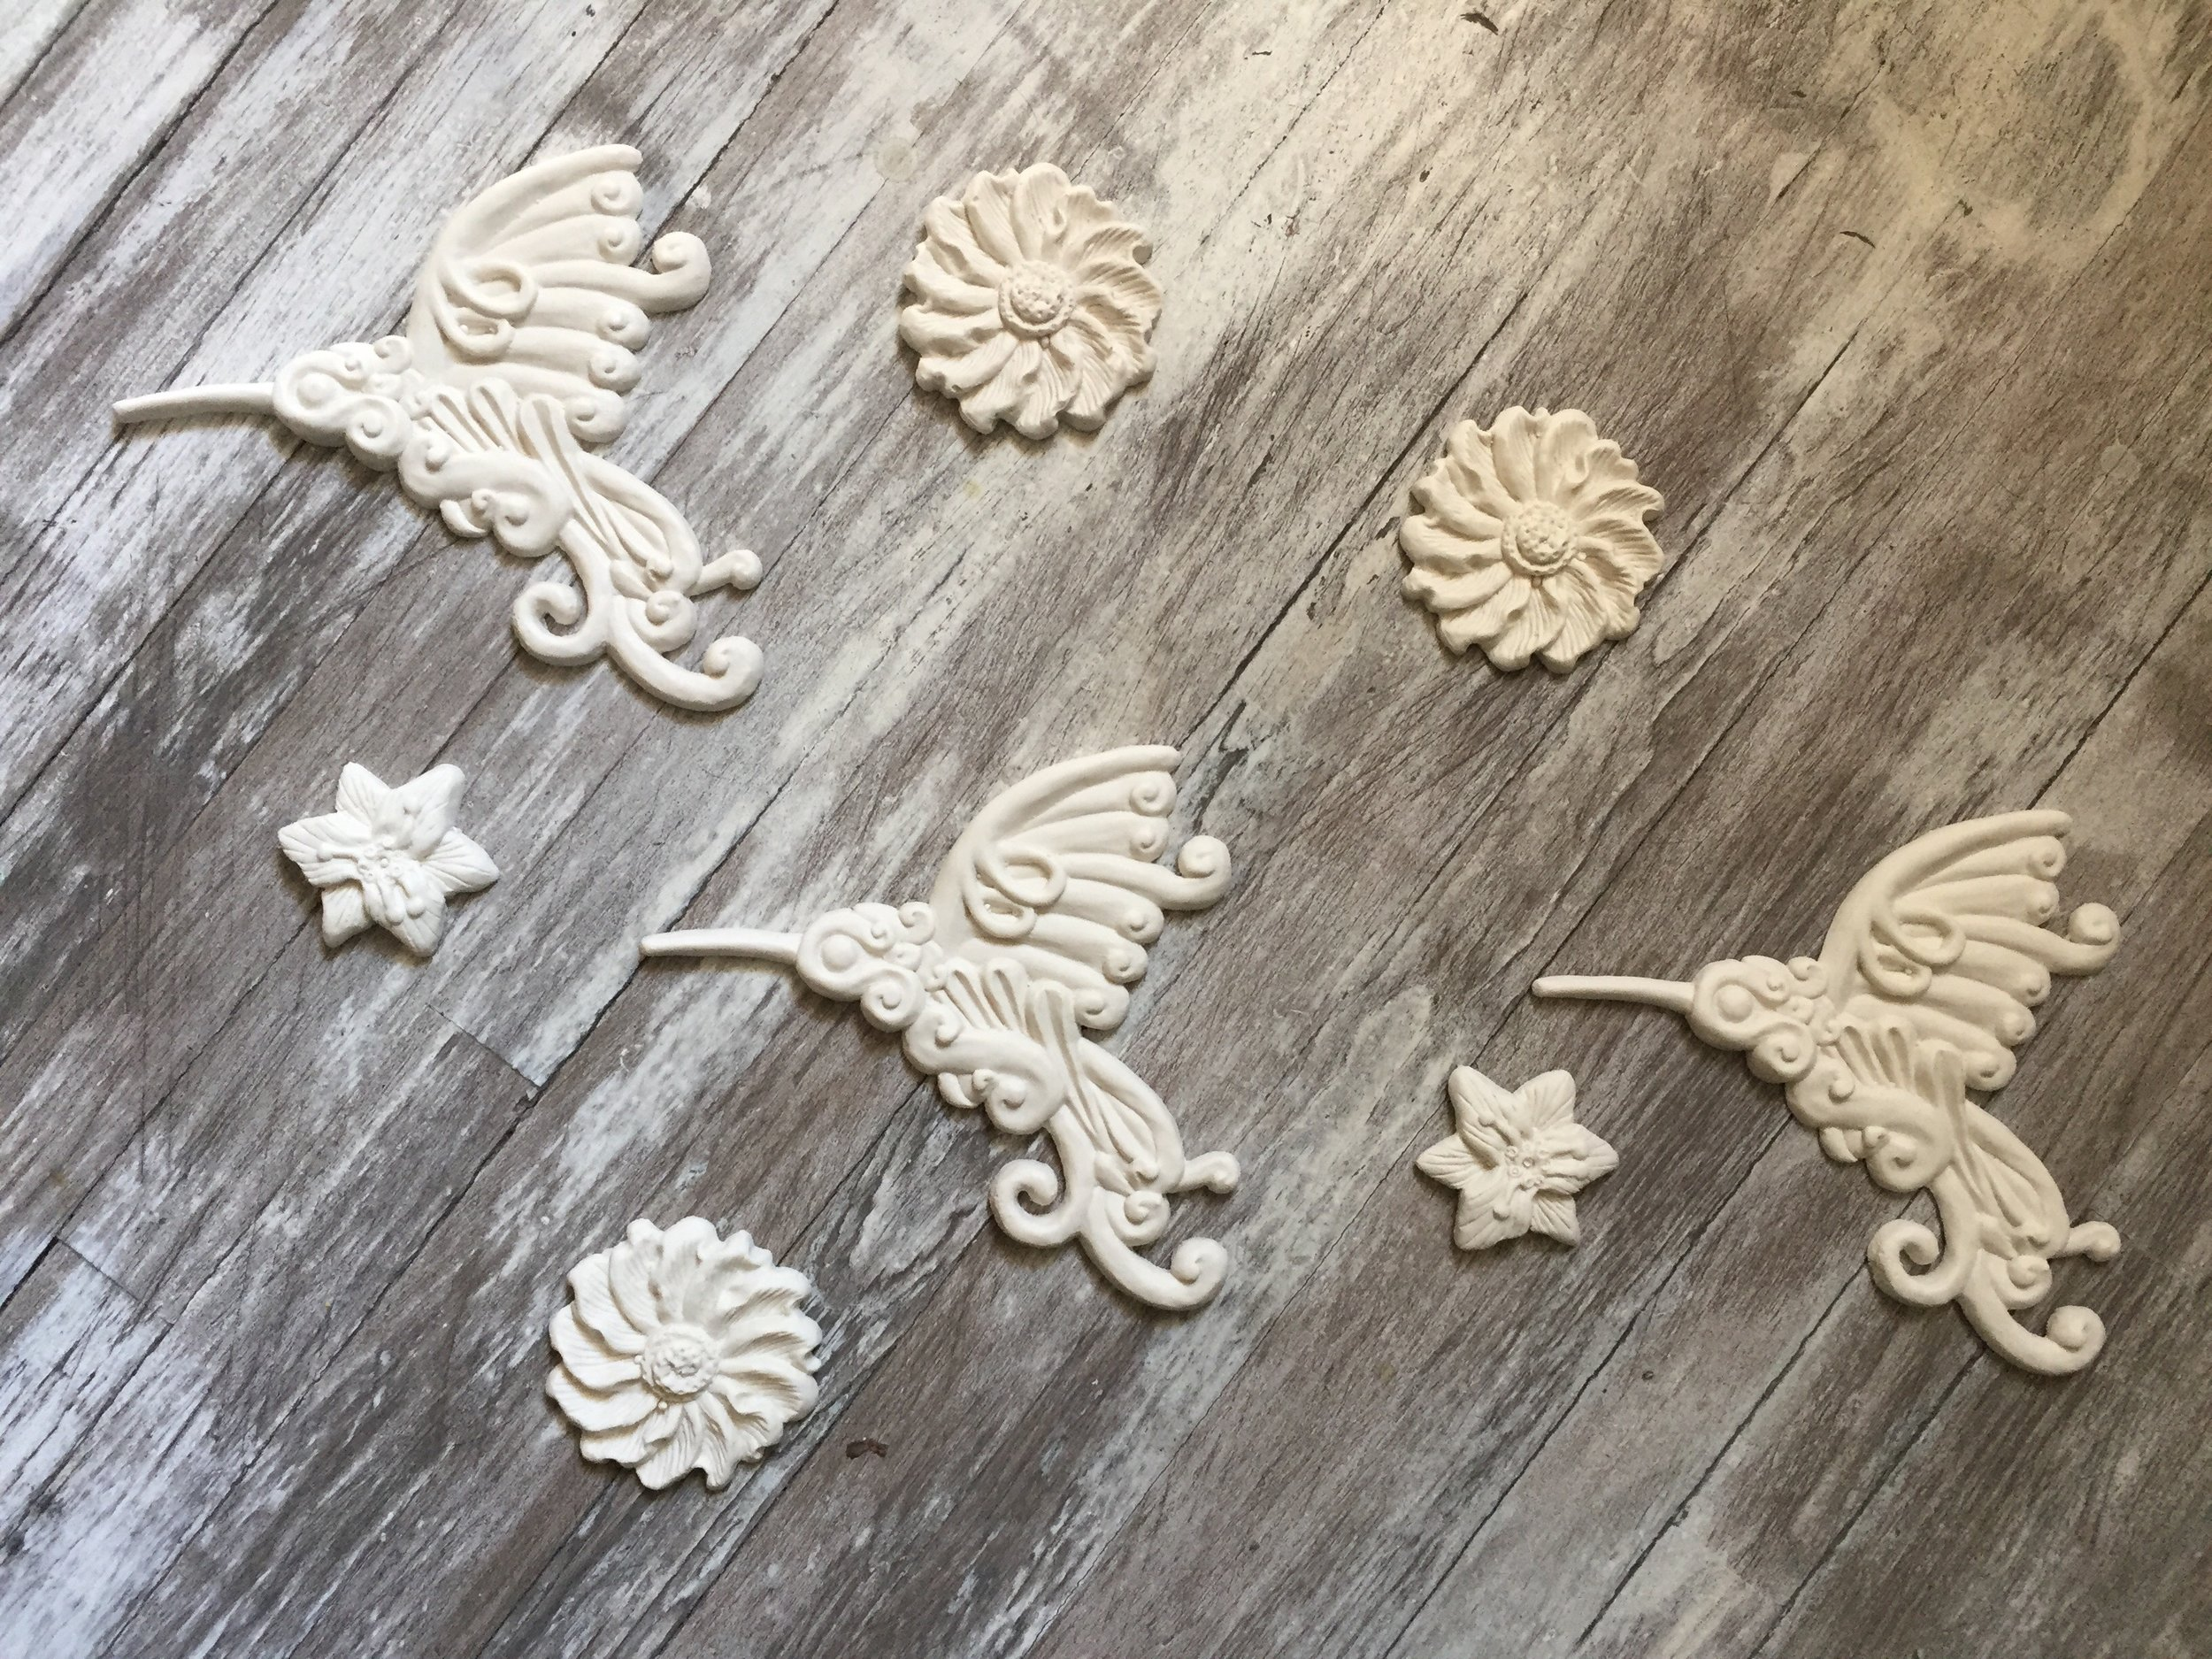 Colibrí y flores 3D